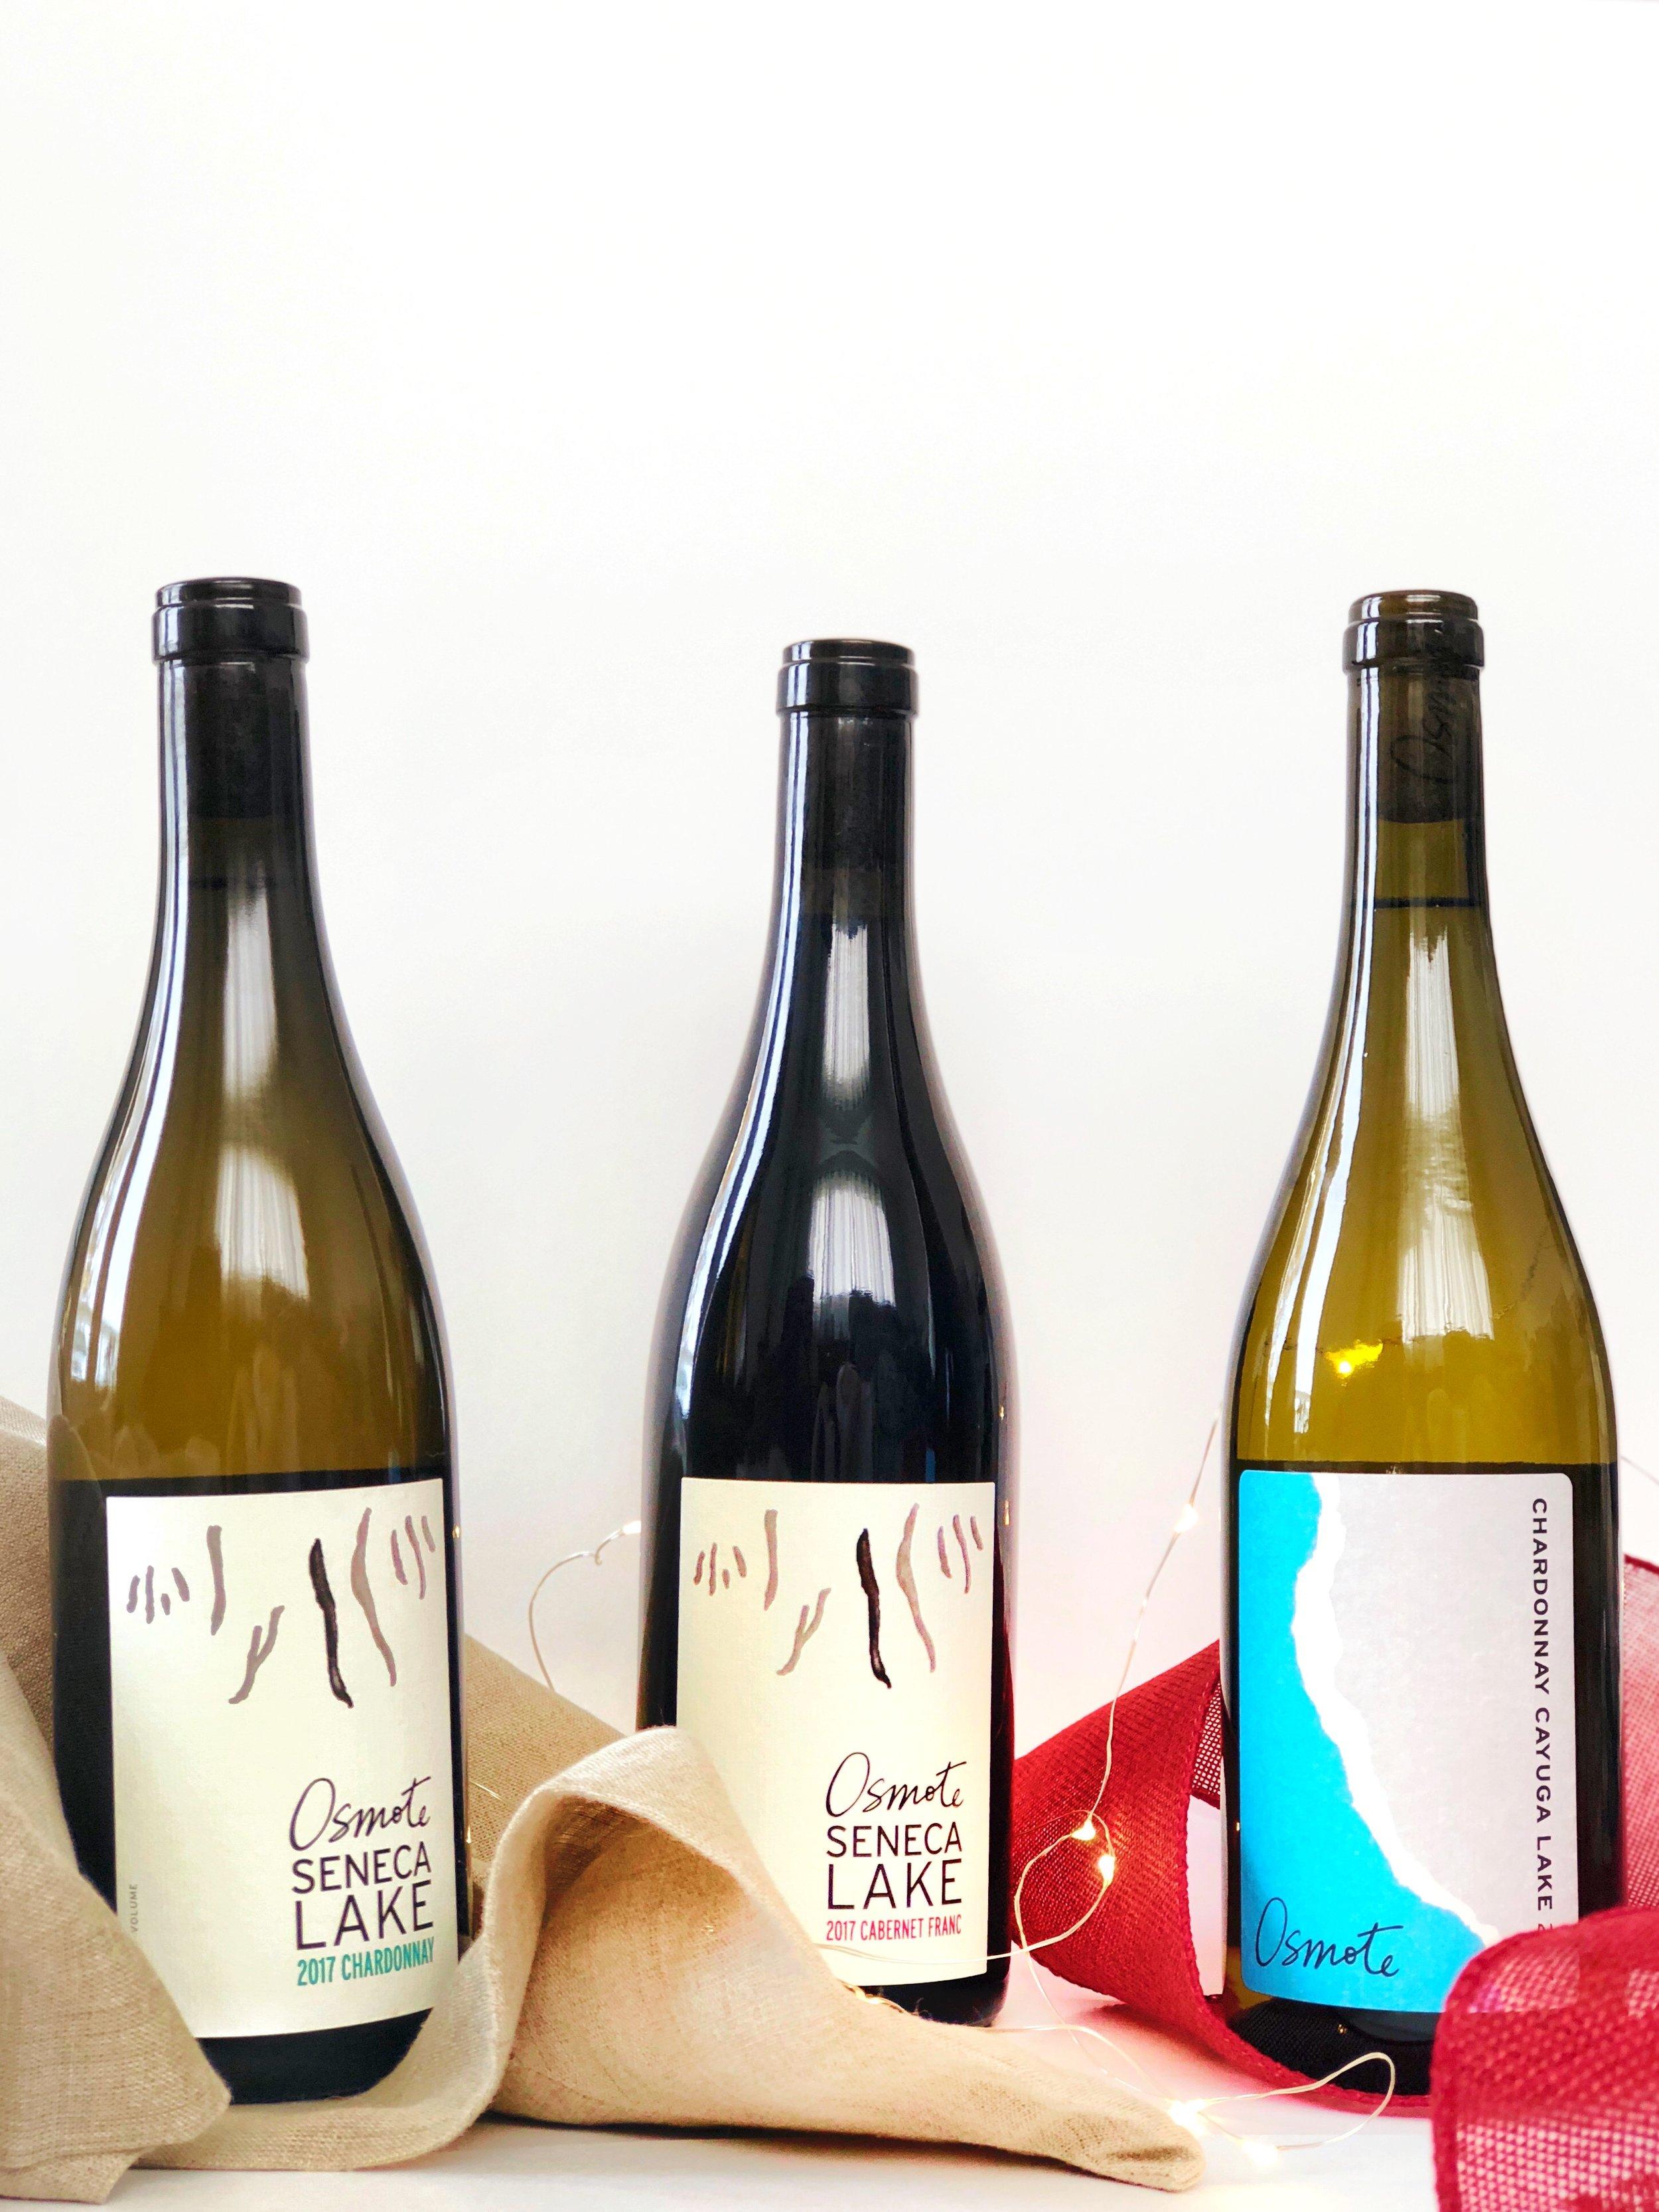 3 Osmote wine bottles on burlap backgrounded by white